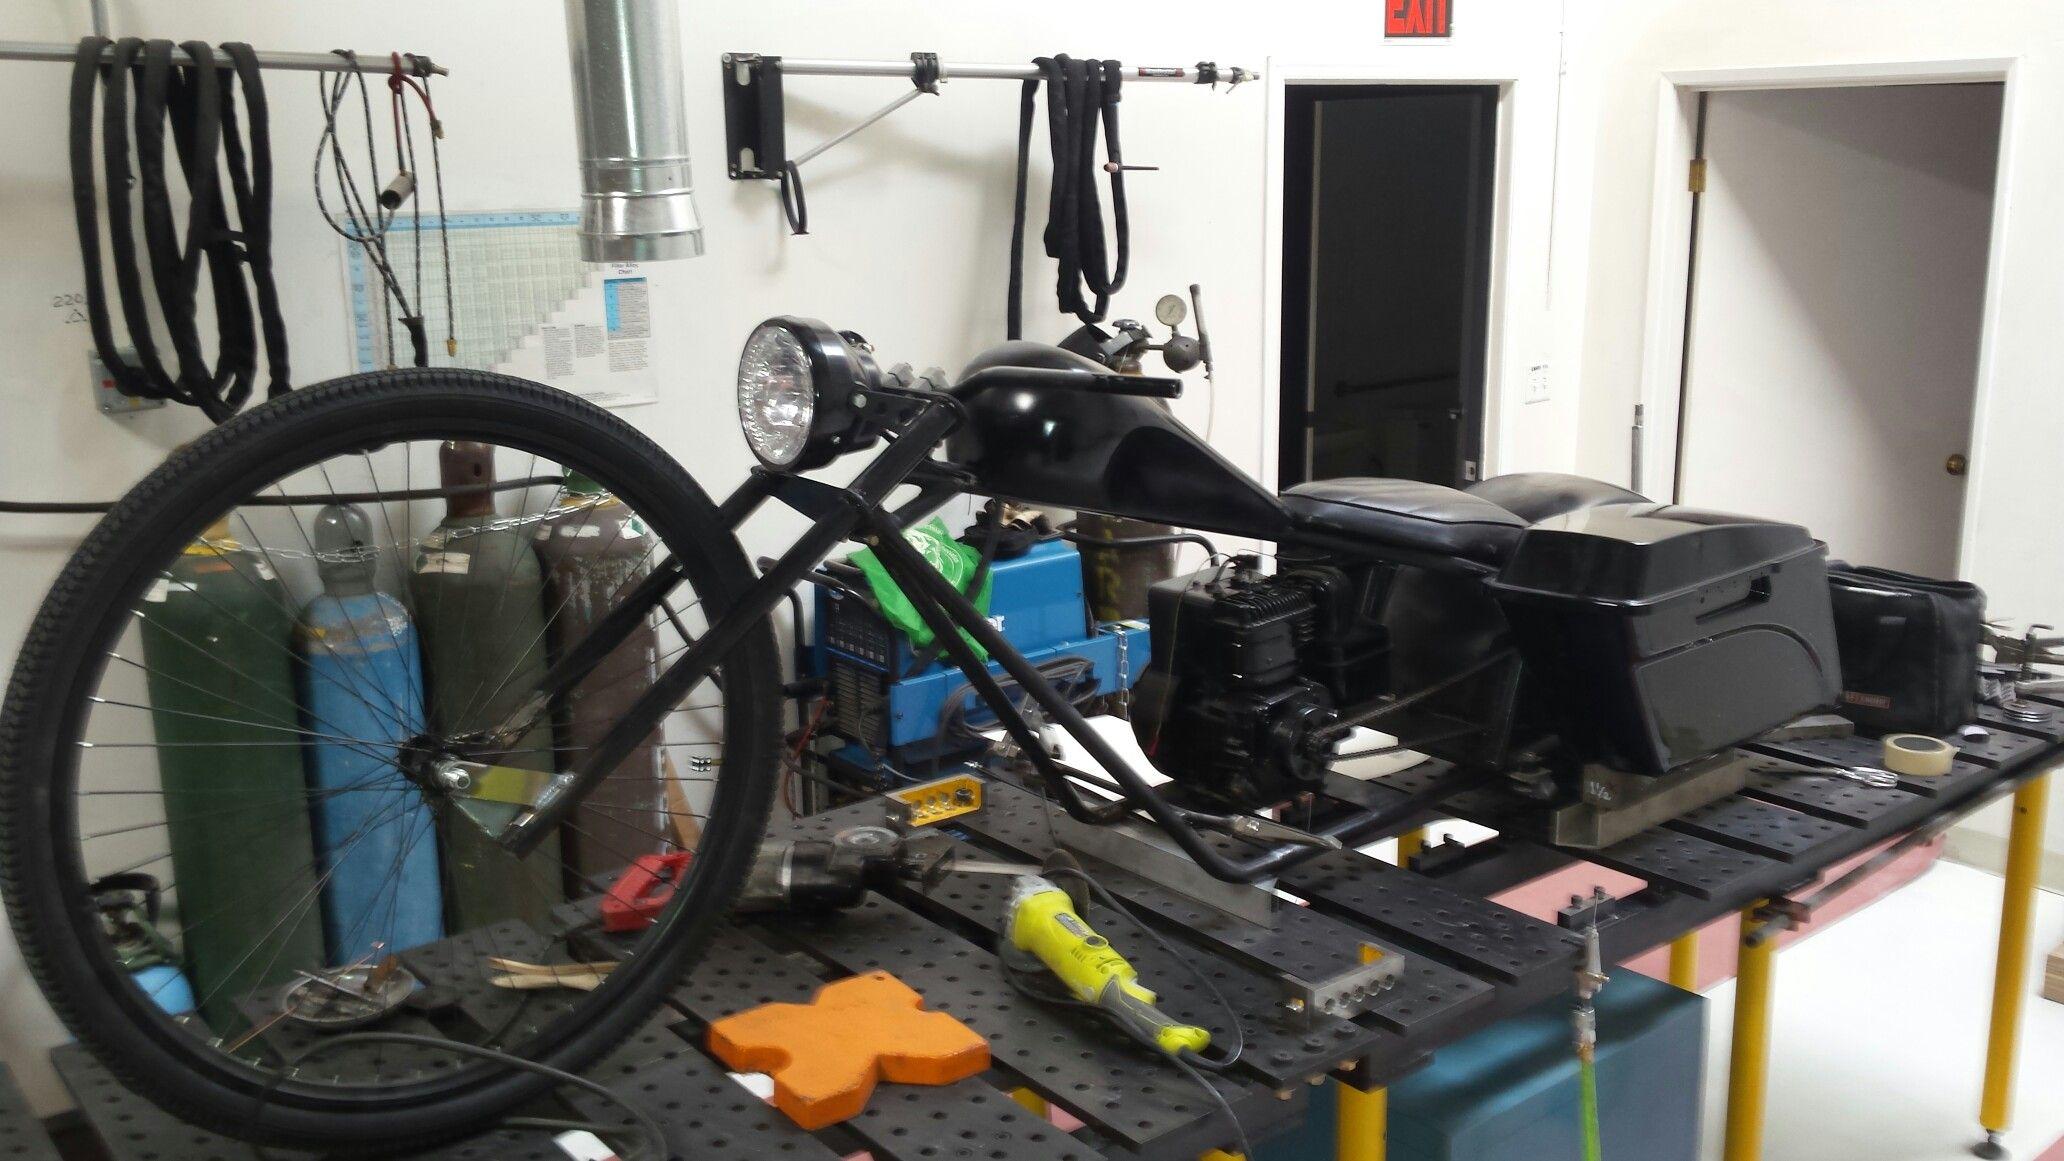 Prächtig Half bagger mini bike build | baggers | Mini bike, Bike, Treadmill @PI_92